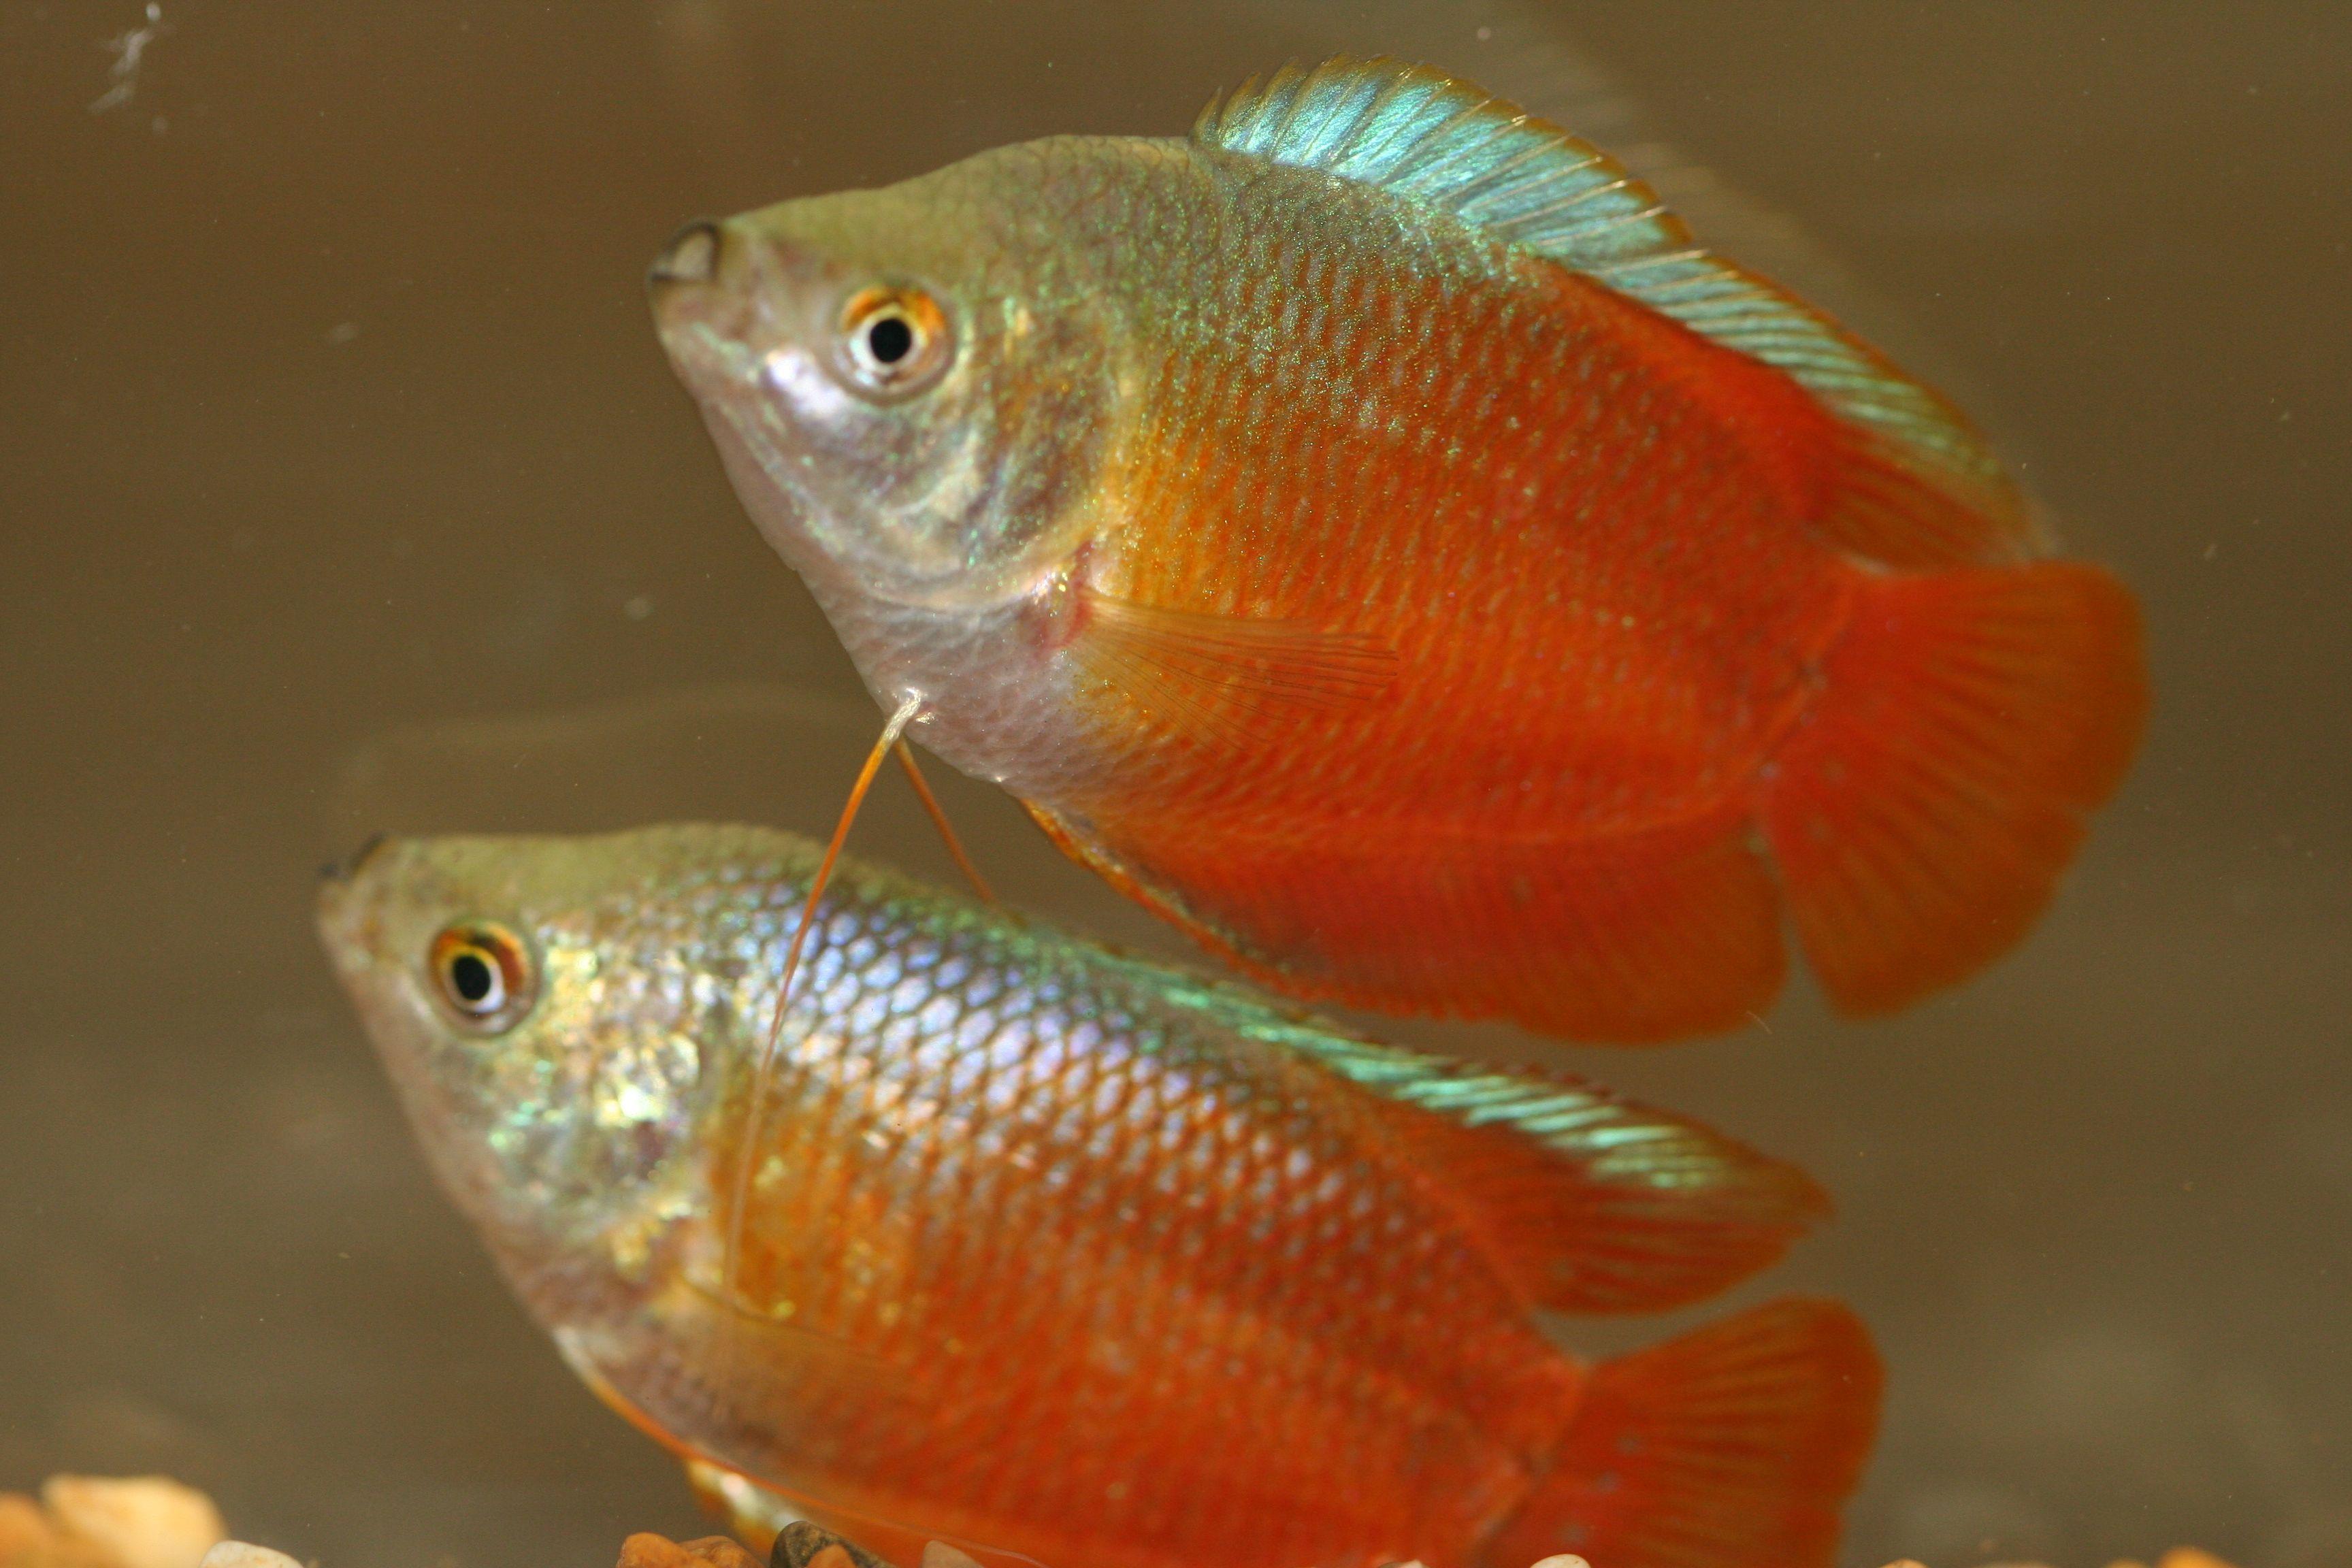 Freshwater fish care - Fish